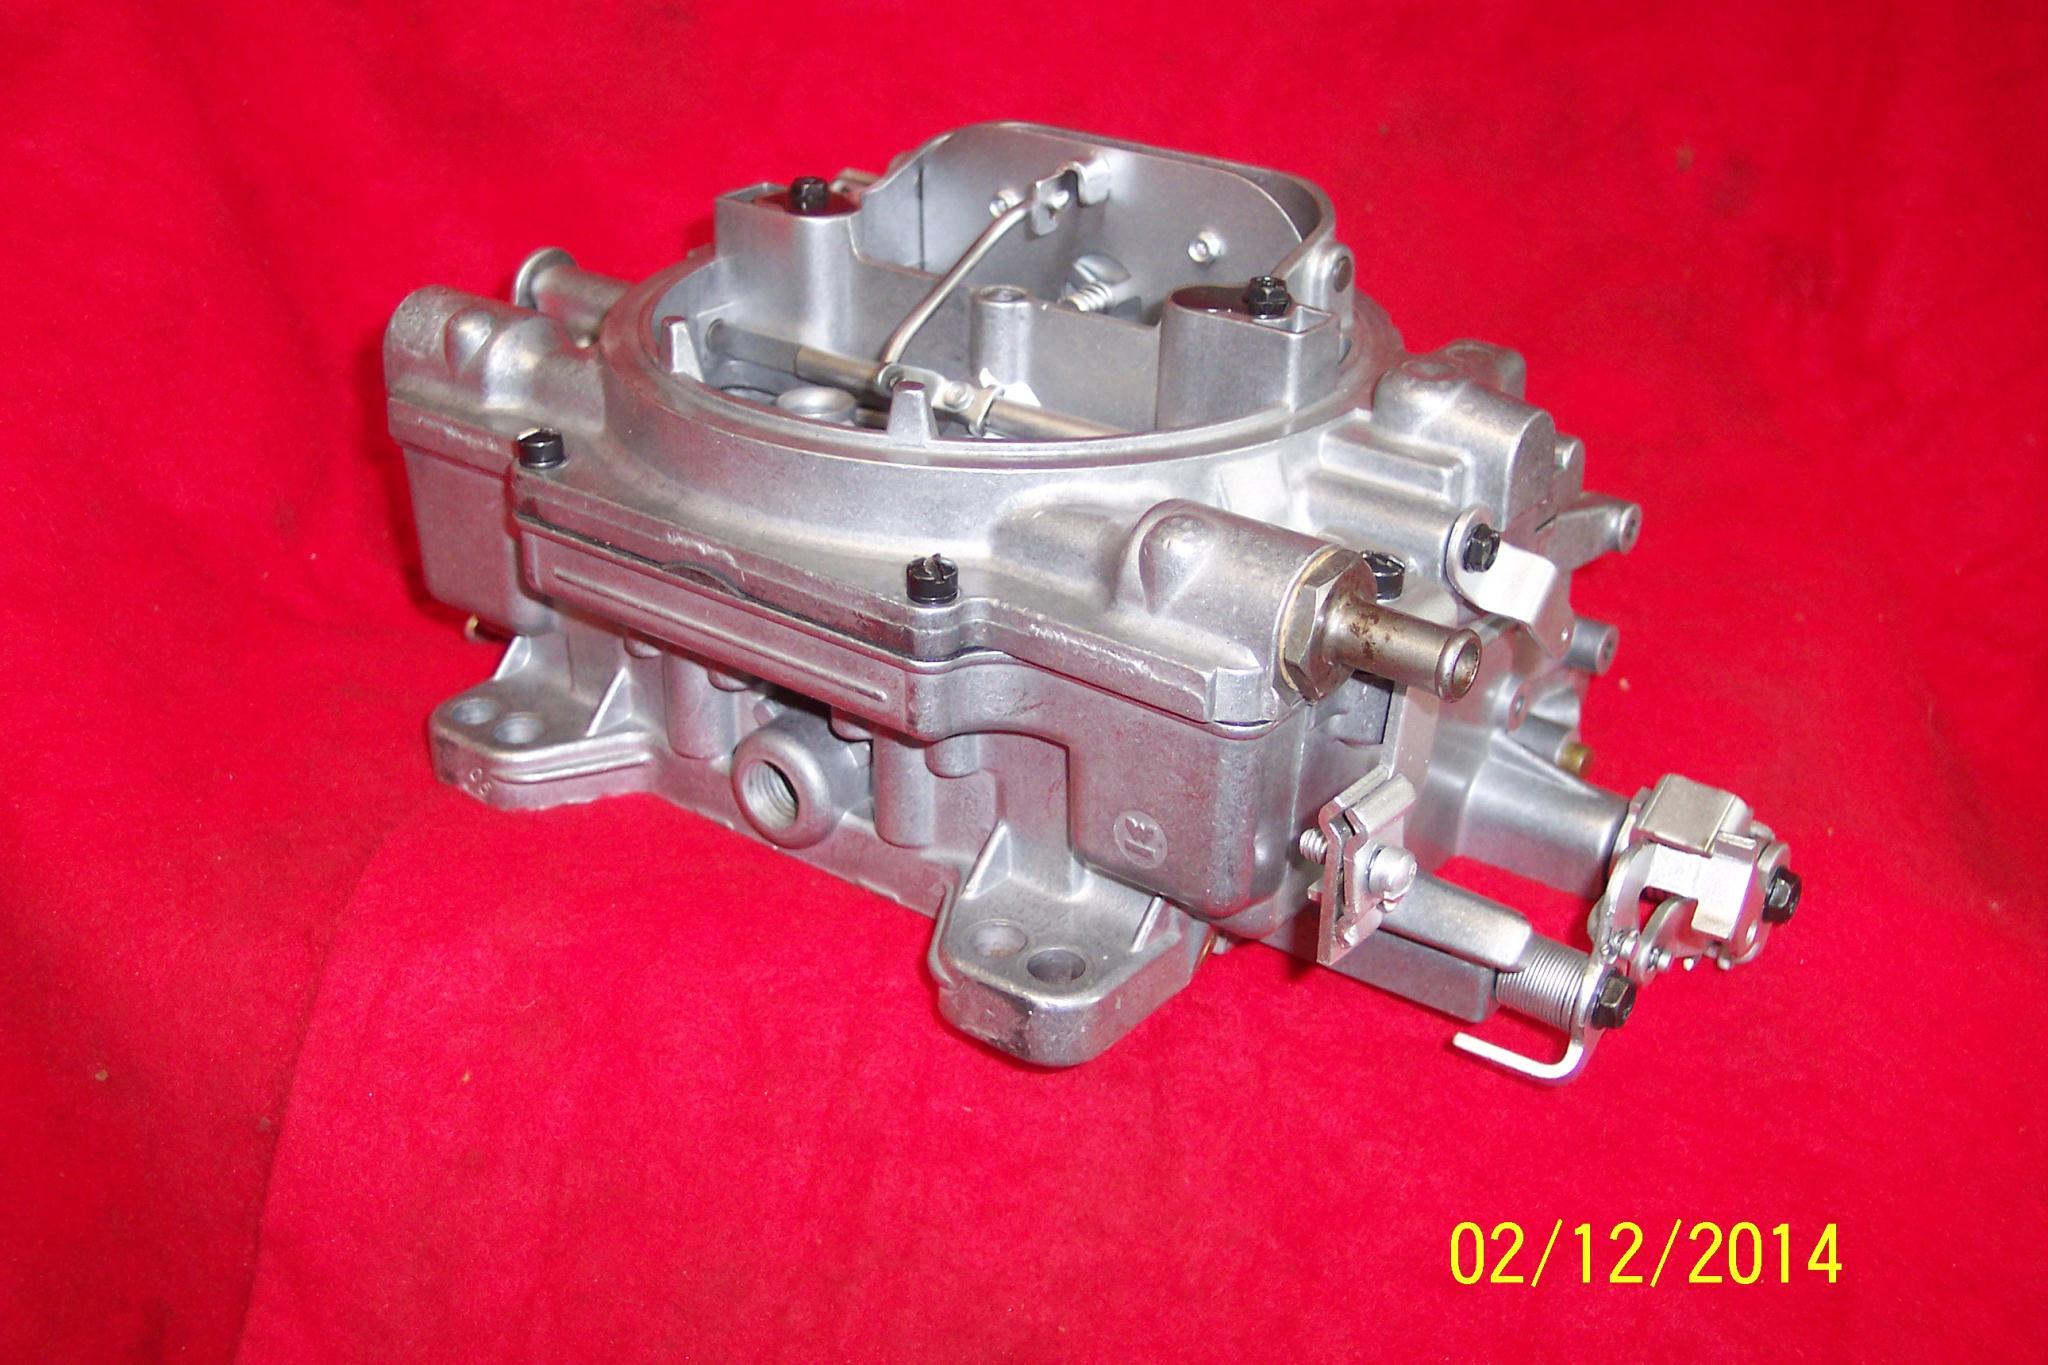 Holley 600 Cfm Carburetor On 73 Buick Vacuum Diagram